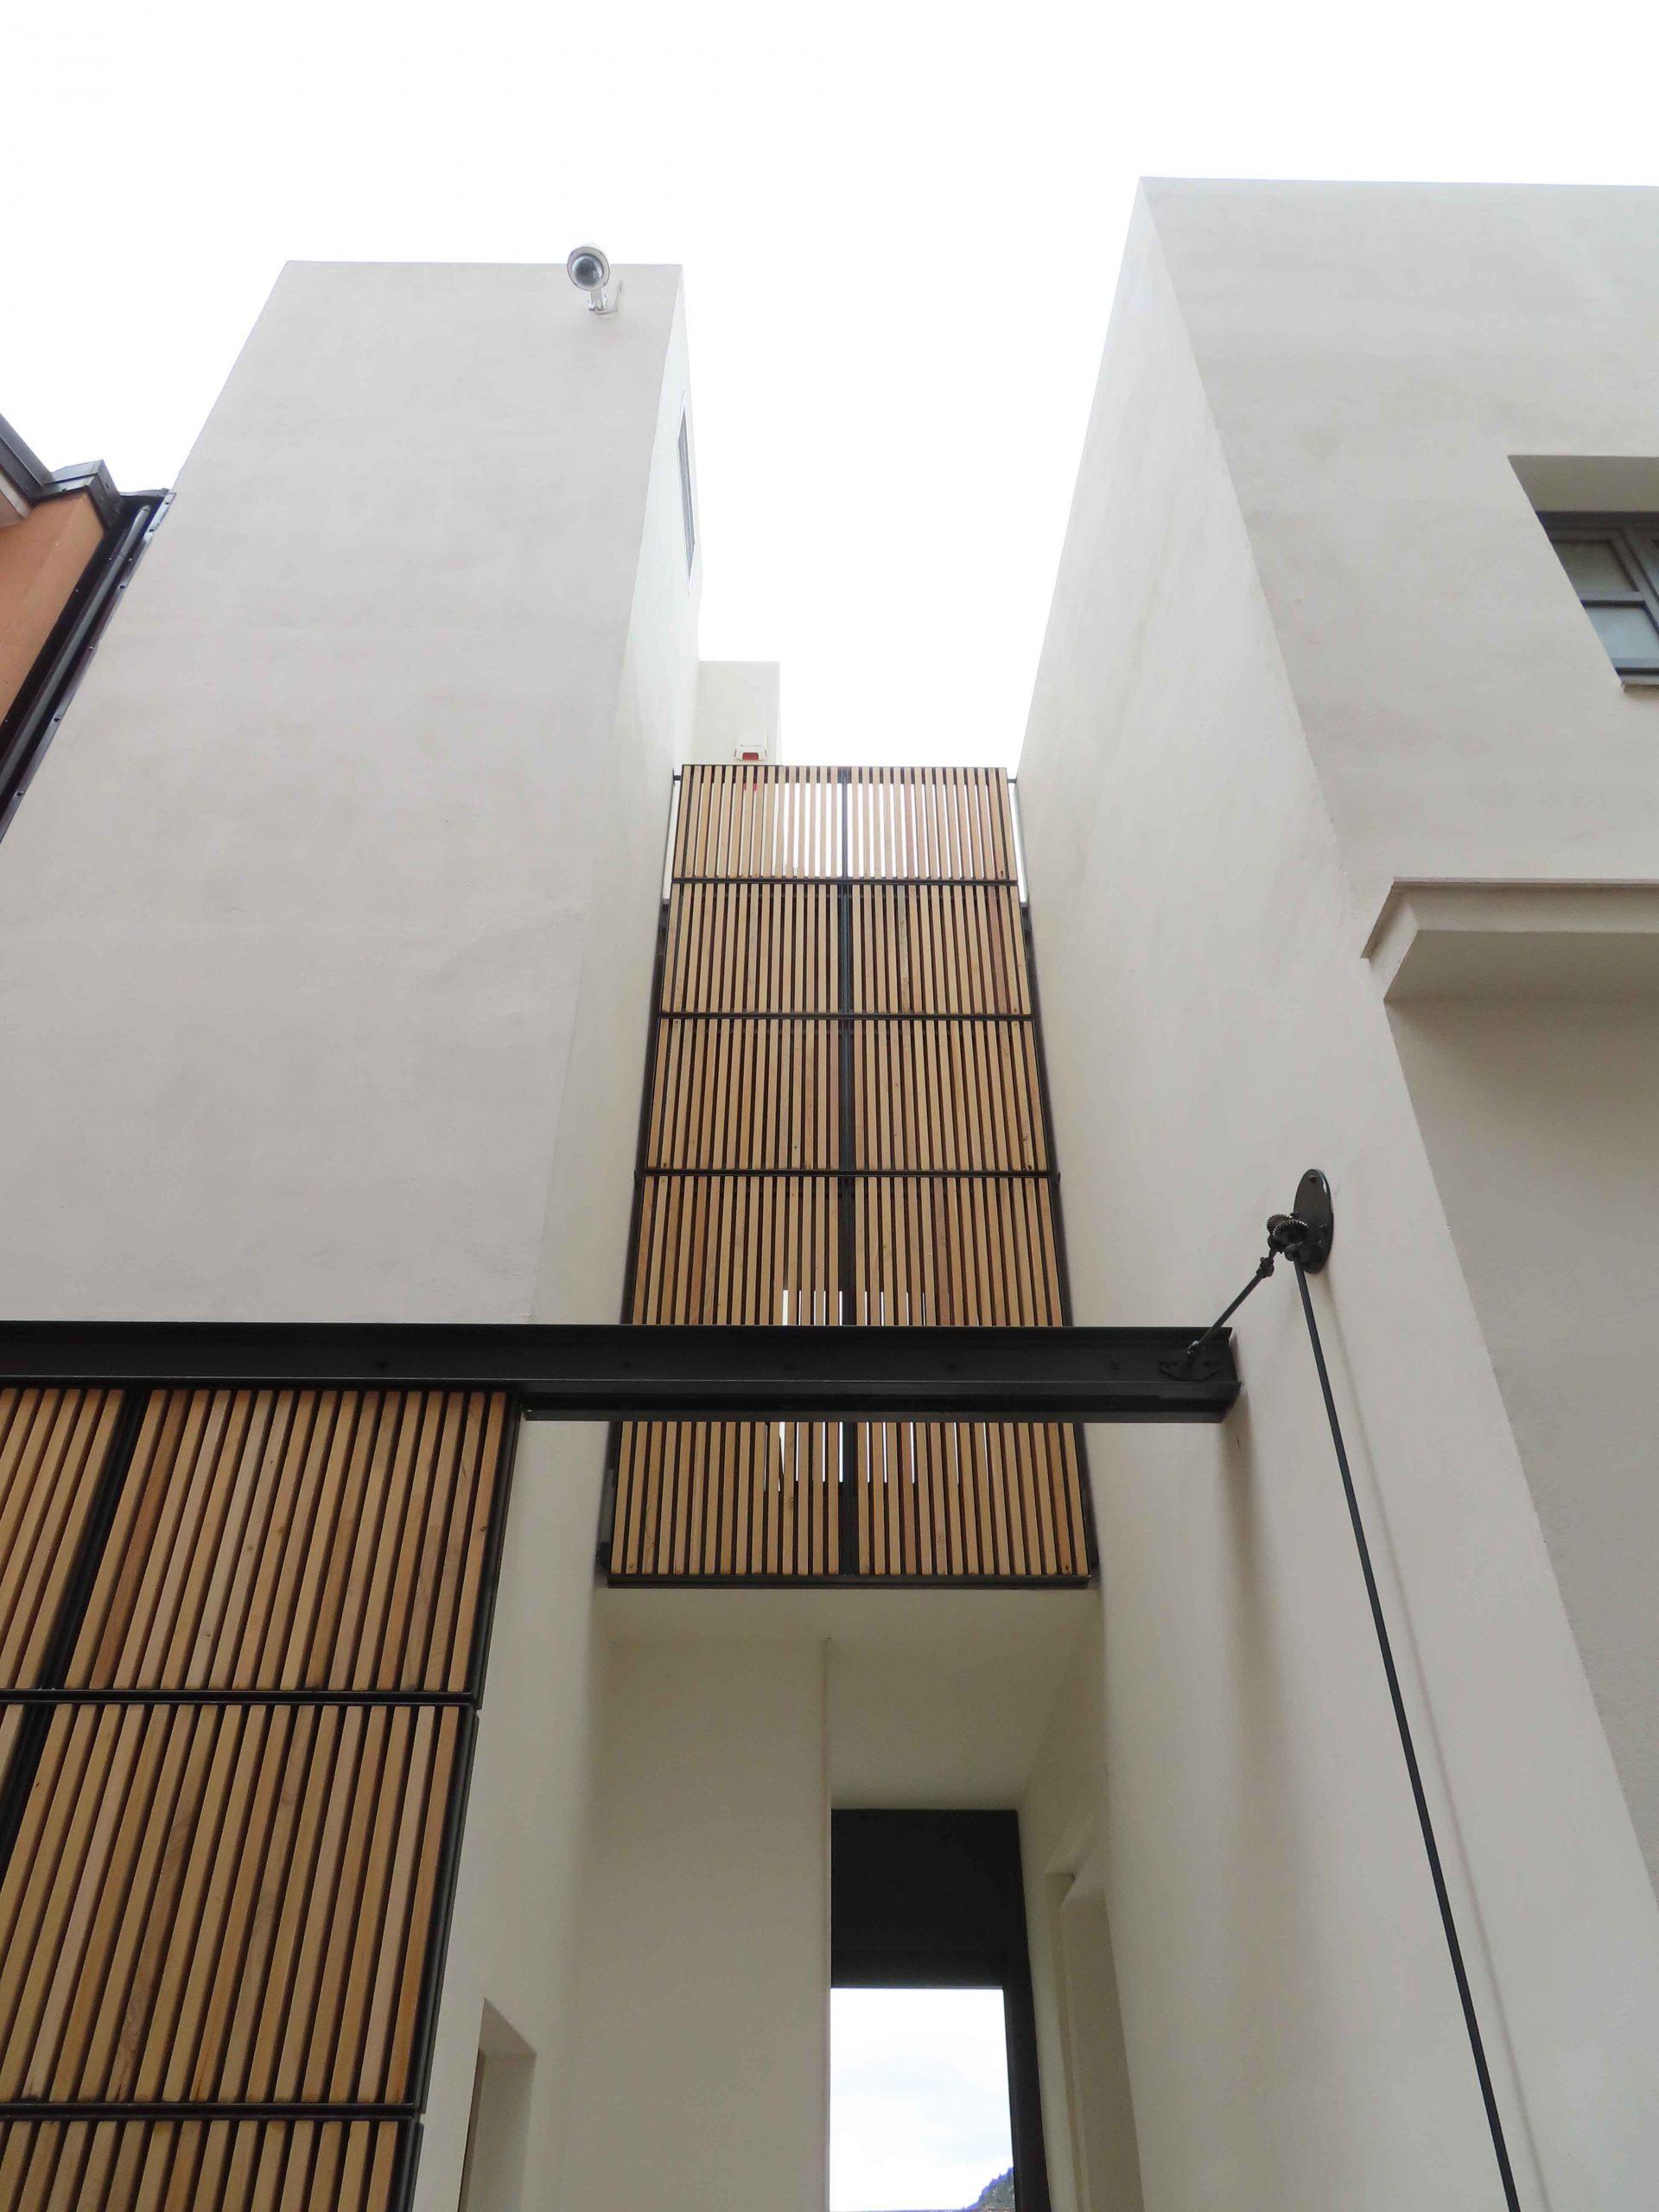 1 CAMUC Casa Museo Cannas Ph. Studio Laibe architettura 1